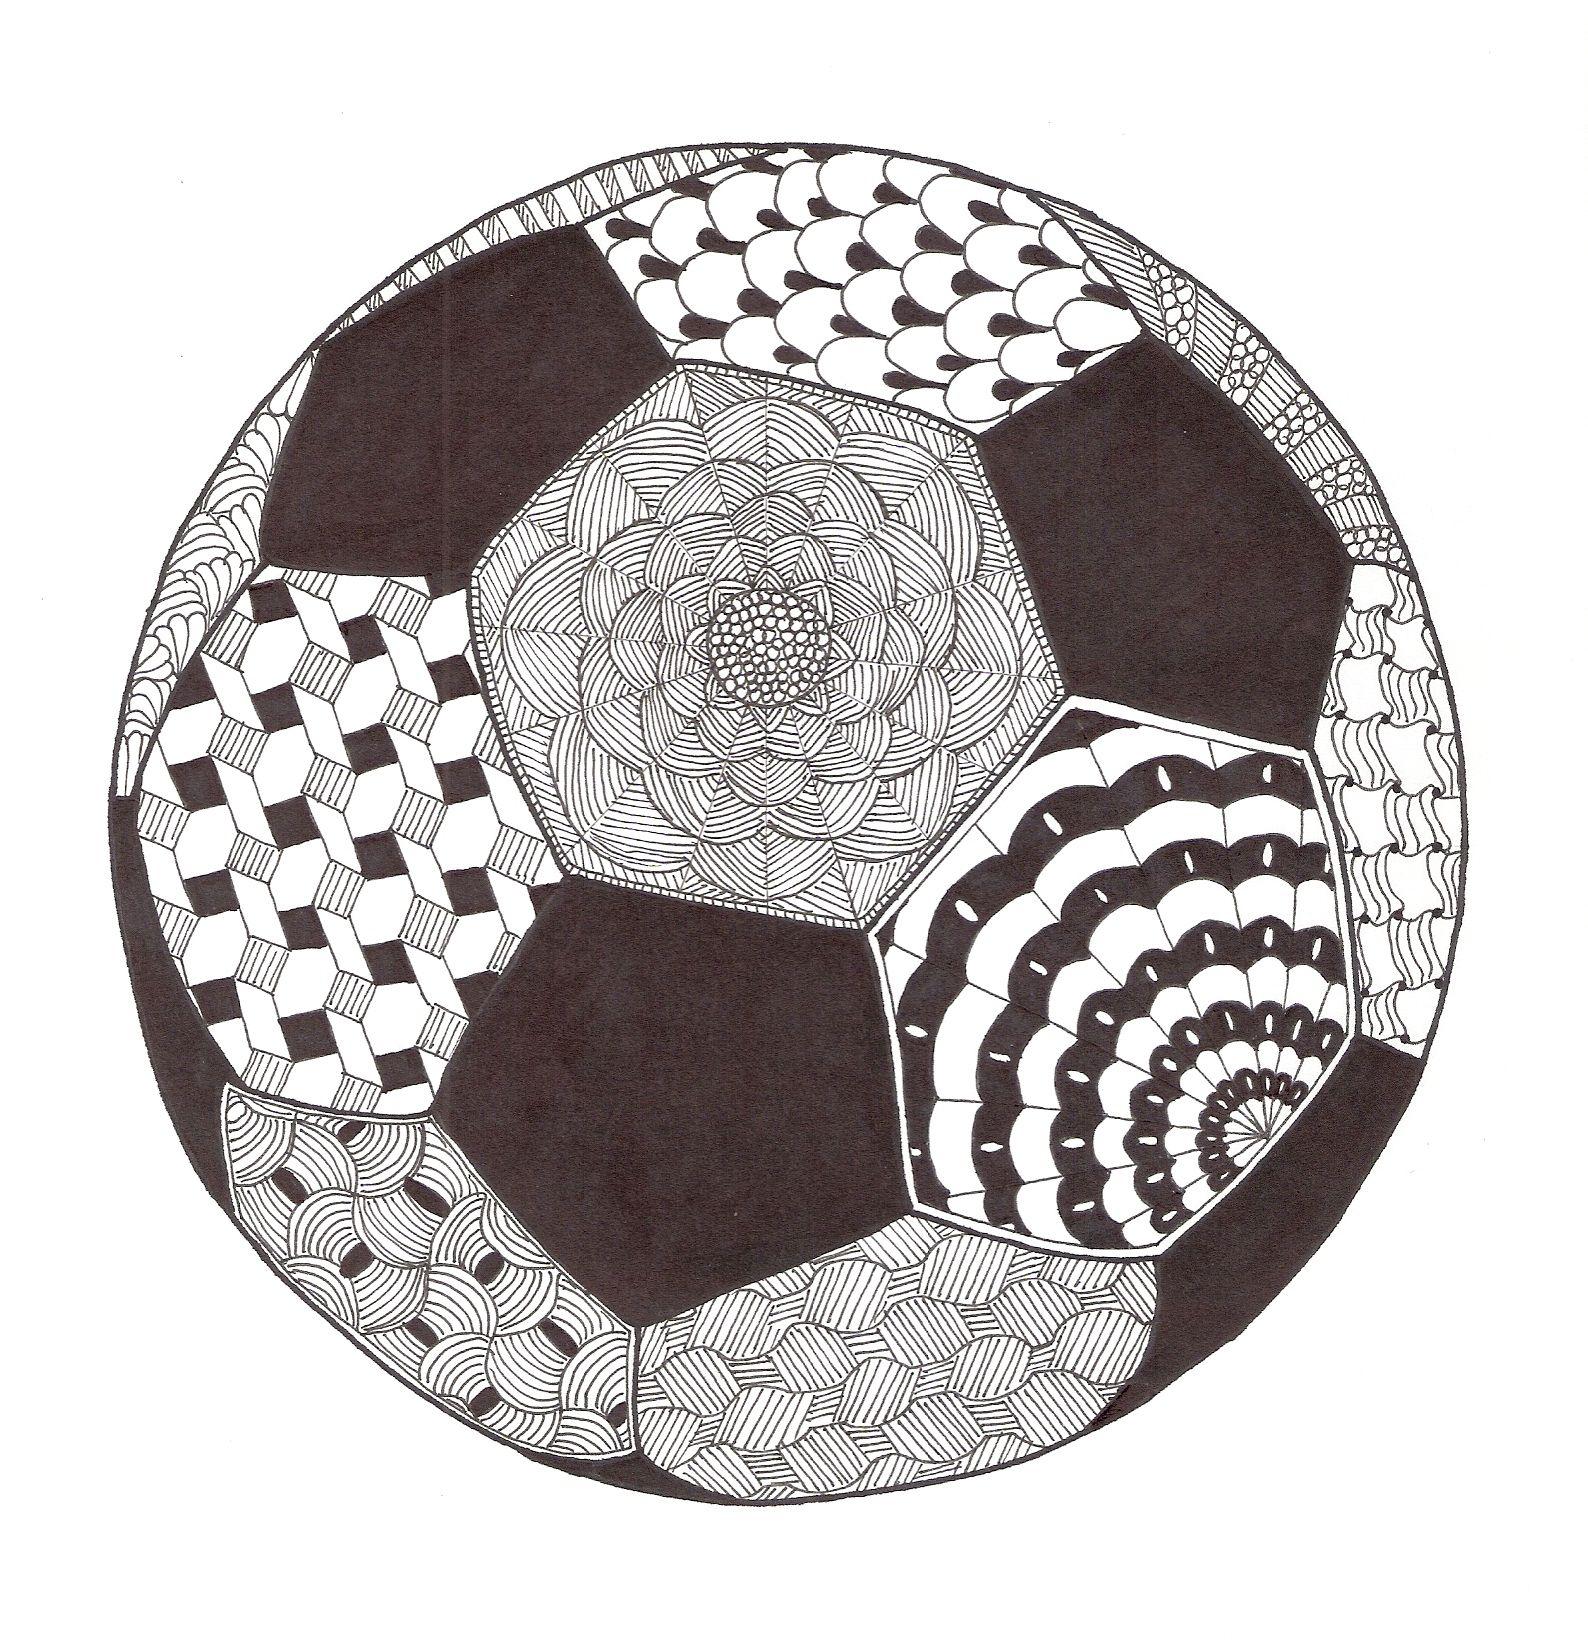 Zentangle Made By Mariska Den Boer 62 Mandala Zentangle Kleurplaten